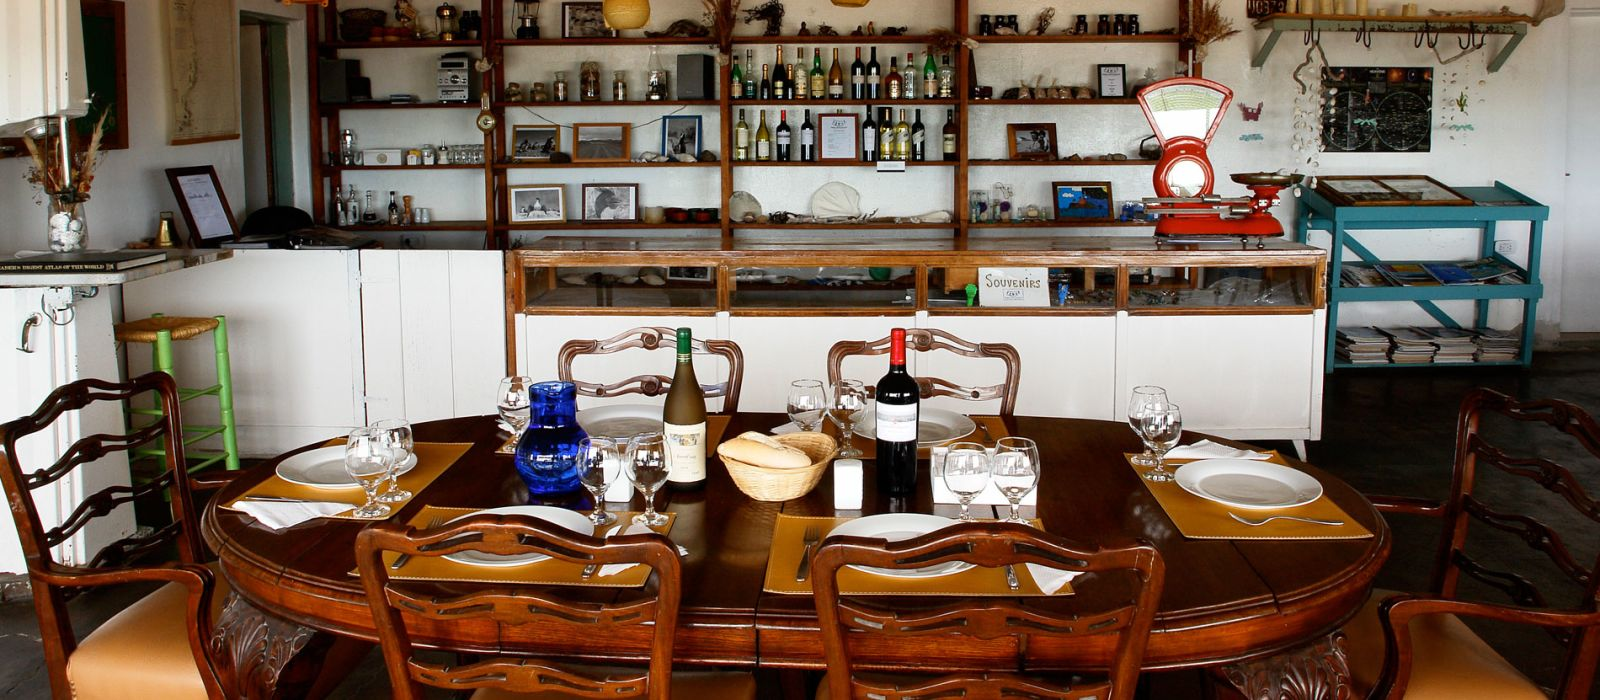 Hotel Bahia Bustamante Argentina